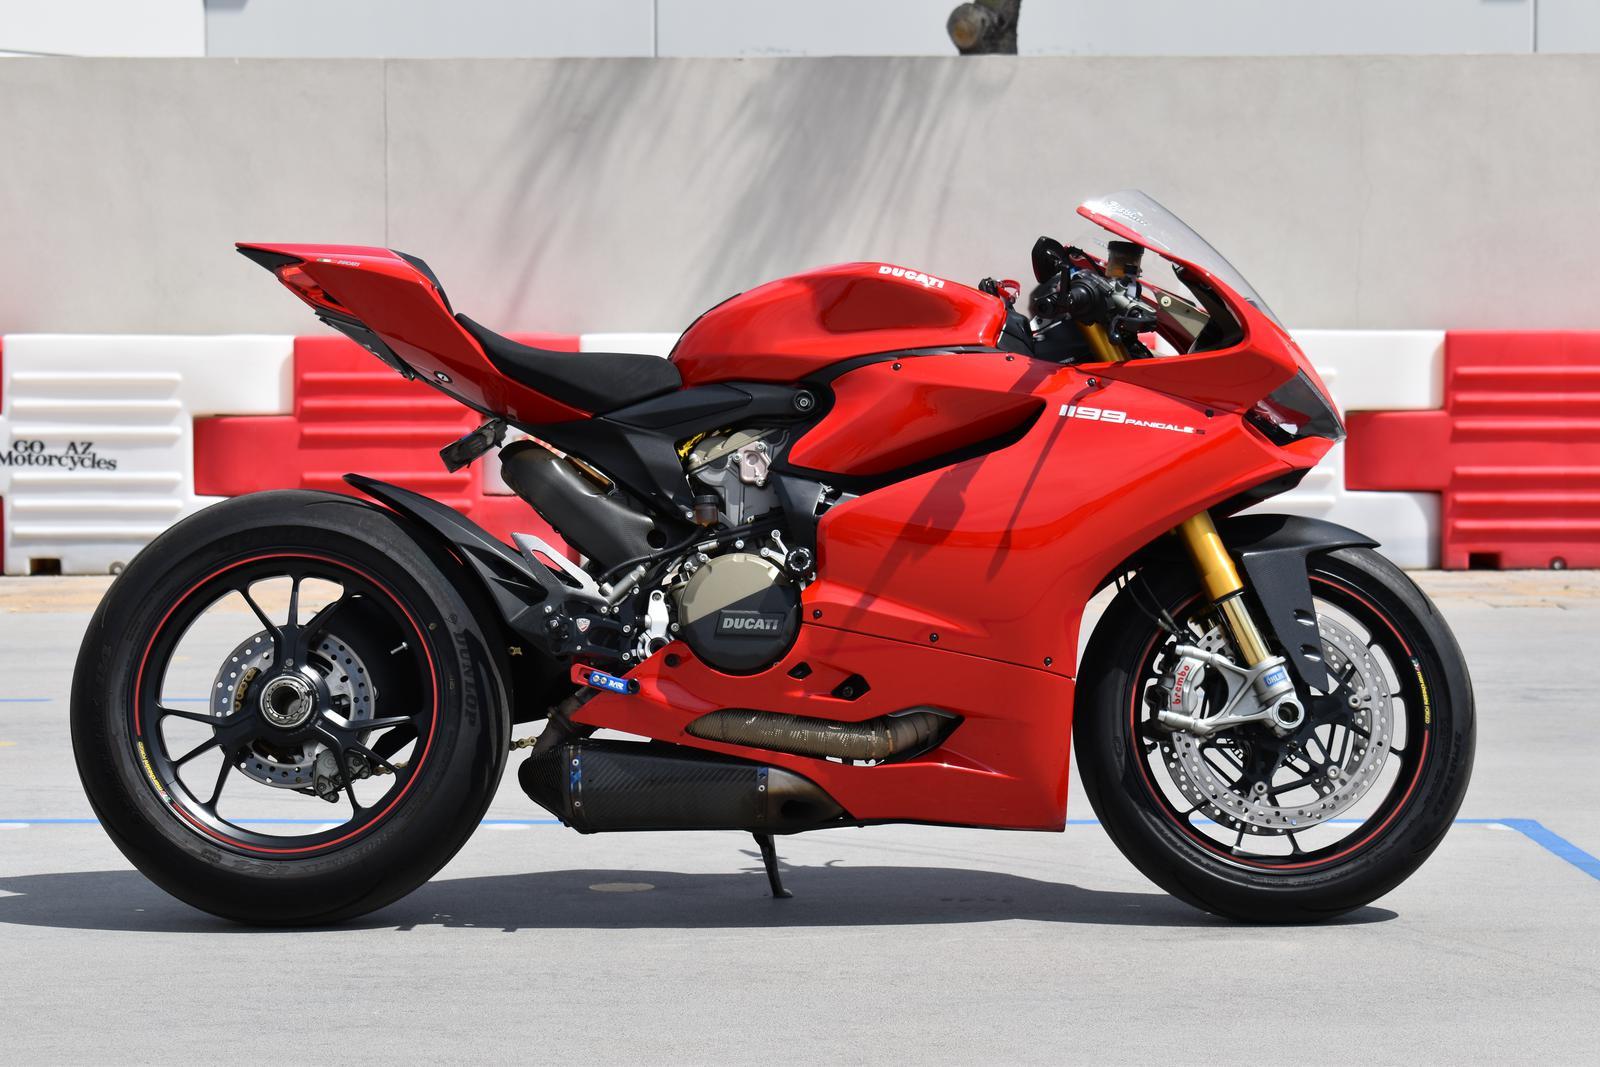 2014 Ducati PANIGALE 1199 S